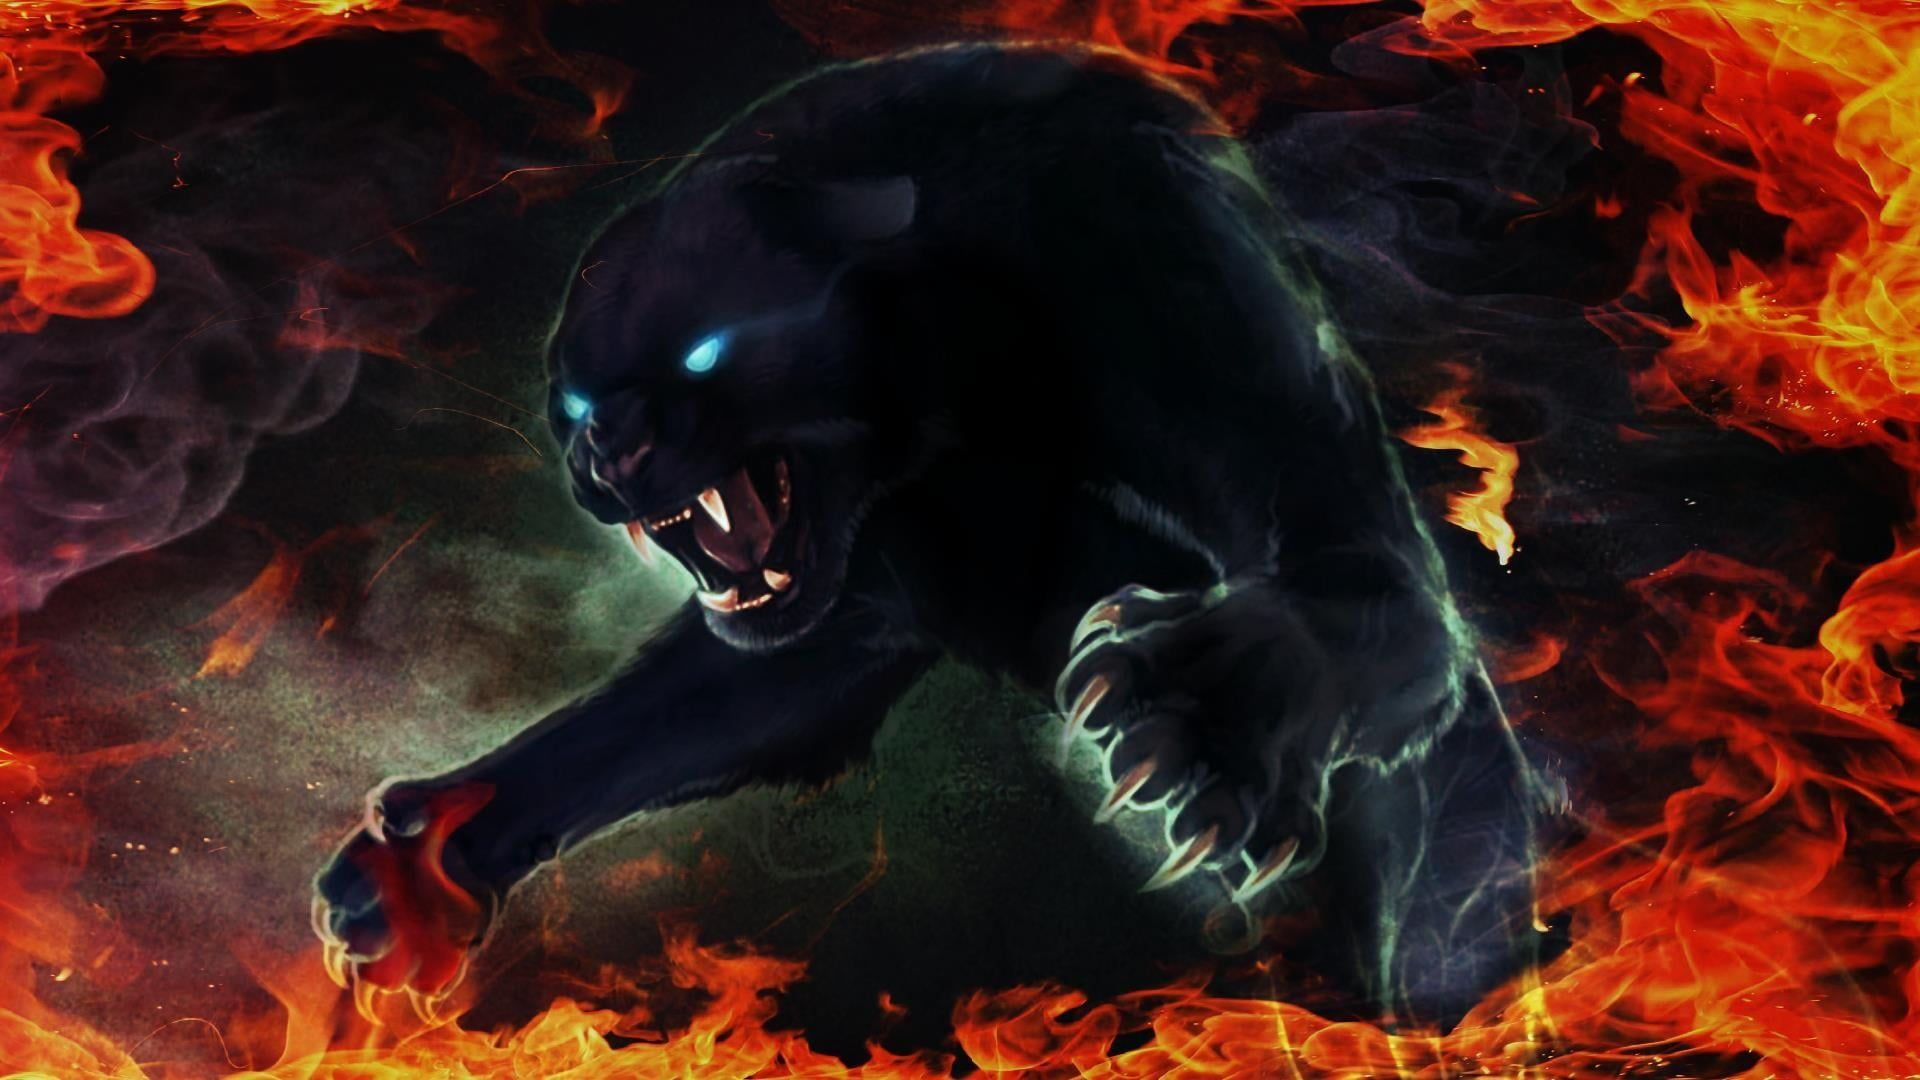 Panther Black Panther Blue Eyes Fire Flame Claw Digital Art 1080p Wallpaper Hdwallpaper Desktop Panther Pictures Black Panther Images Black Panther Cat